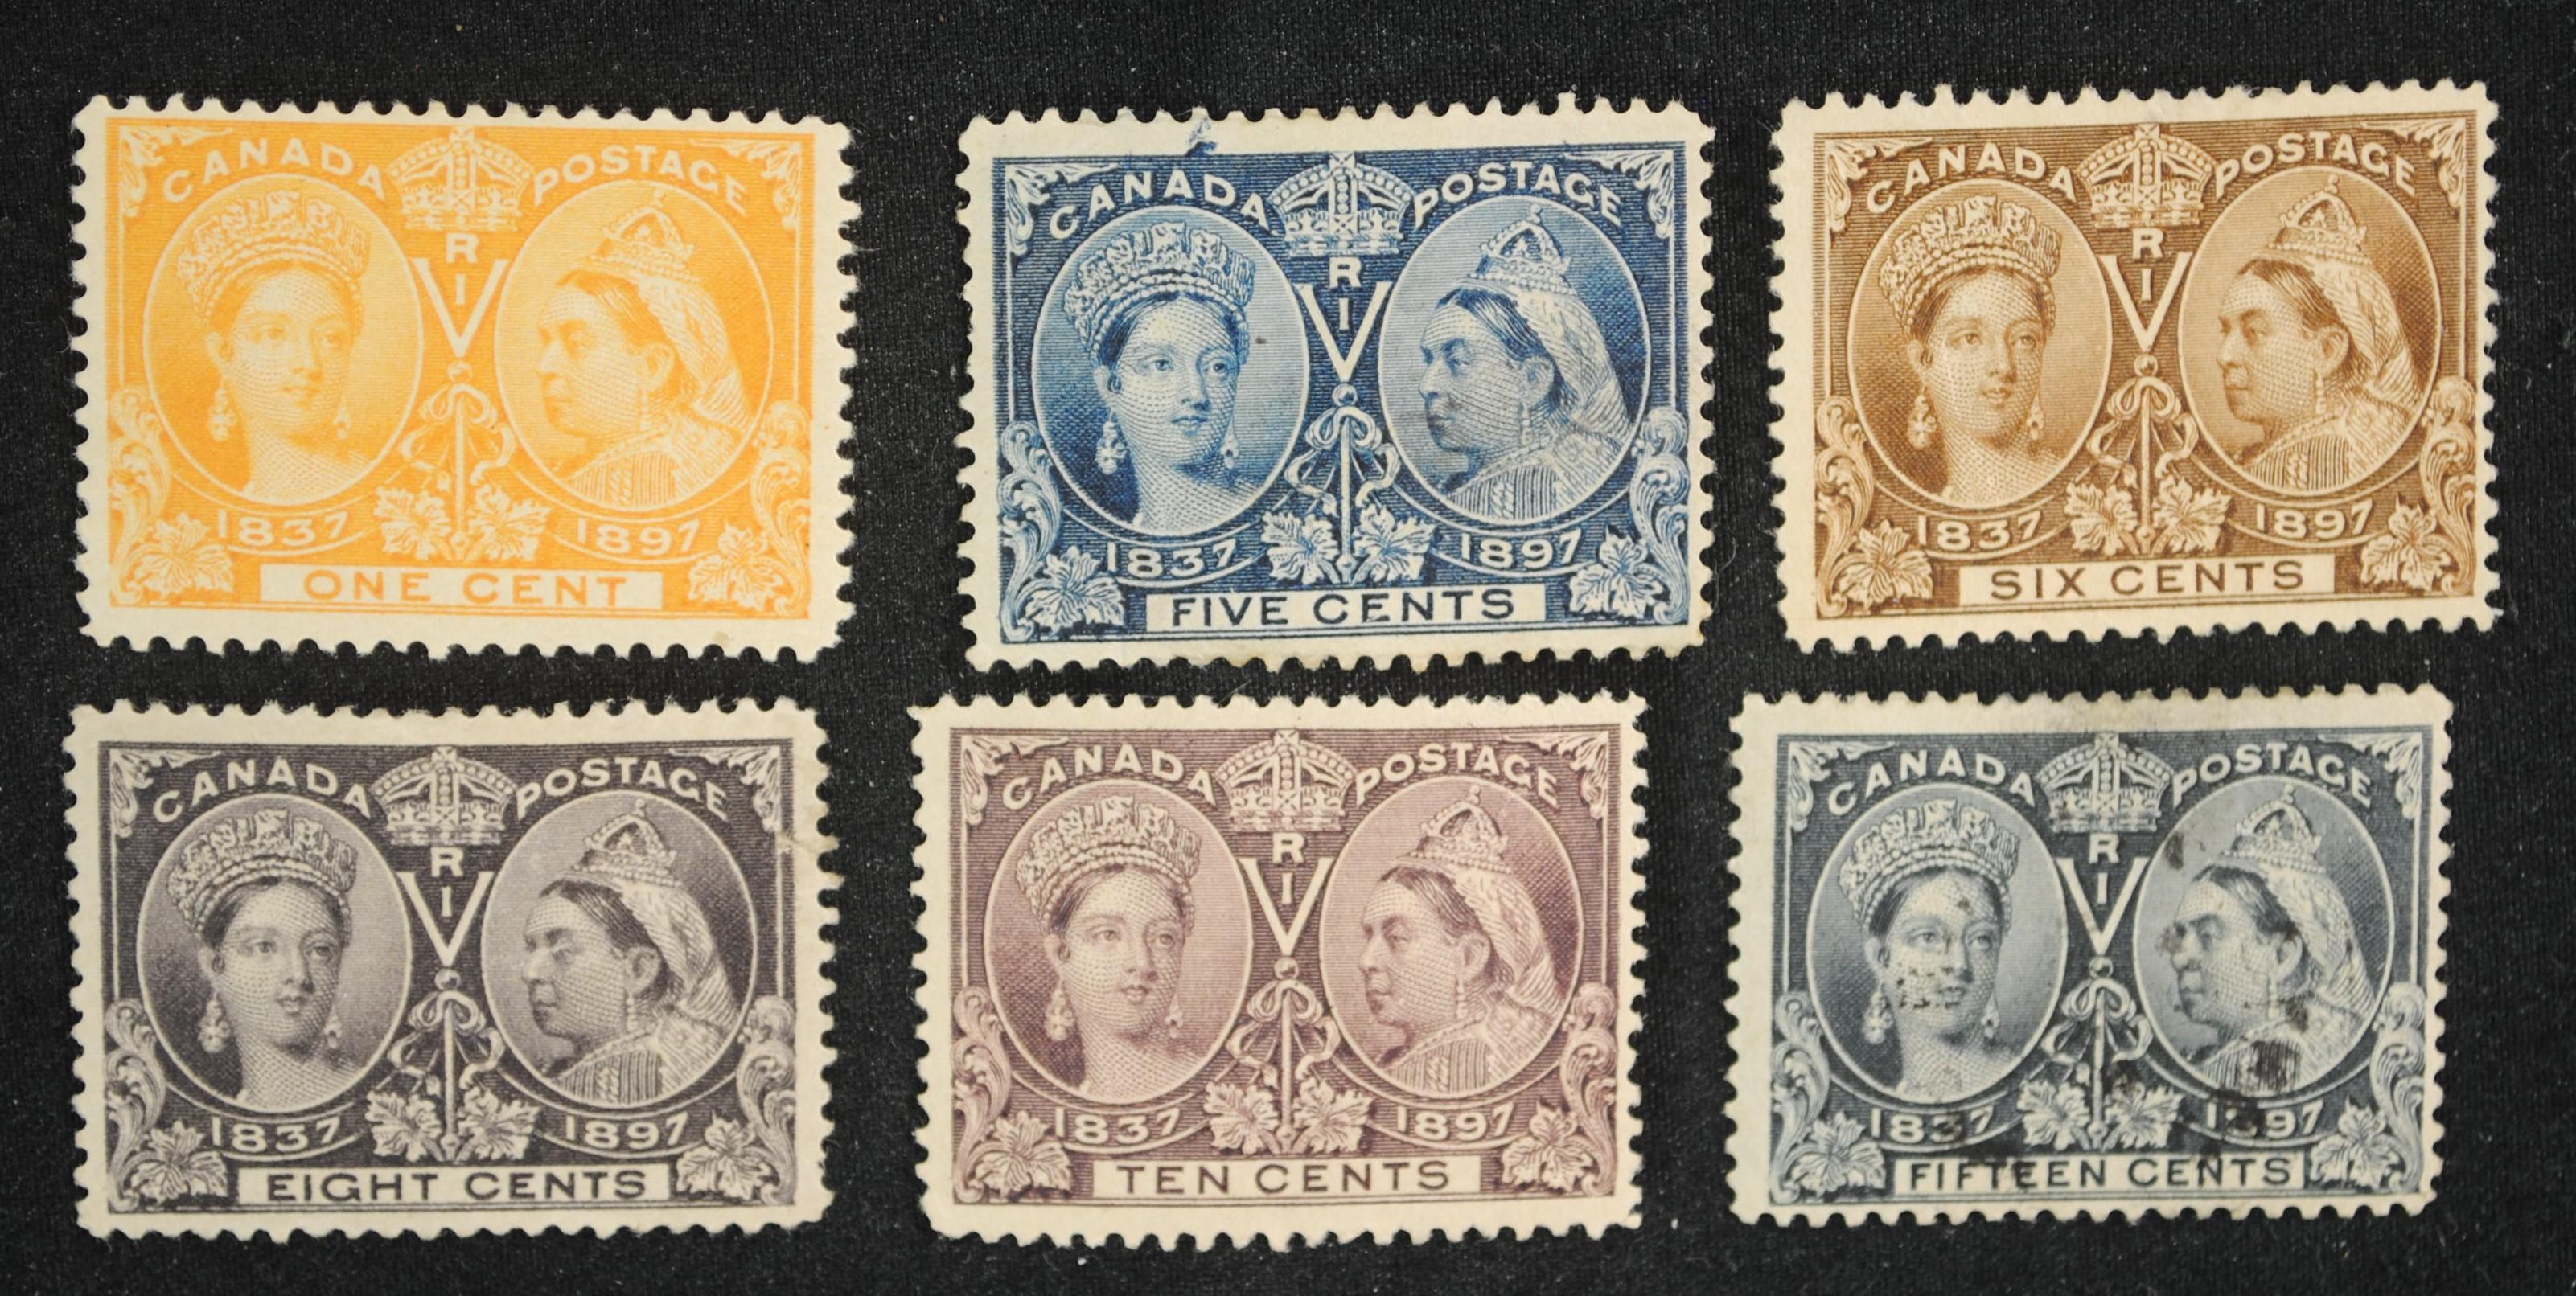 Canada Diamond Jubilee Stamps 1897